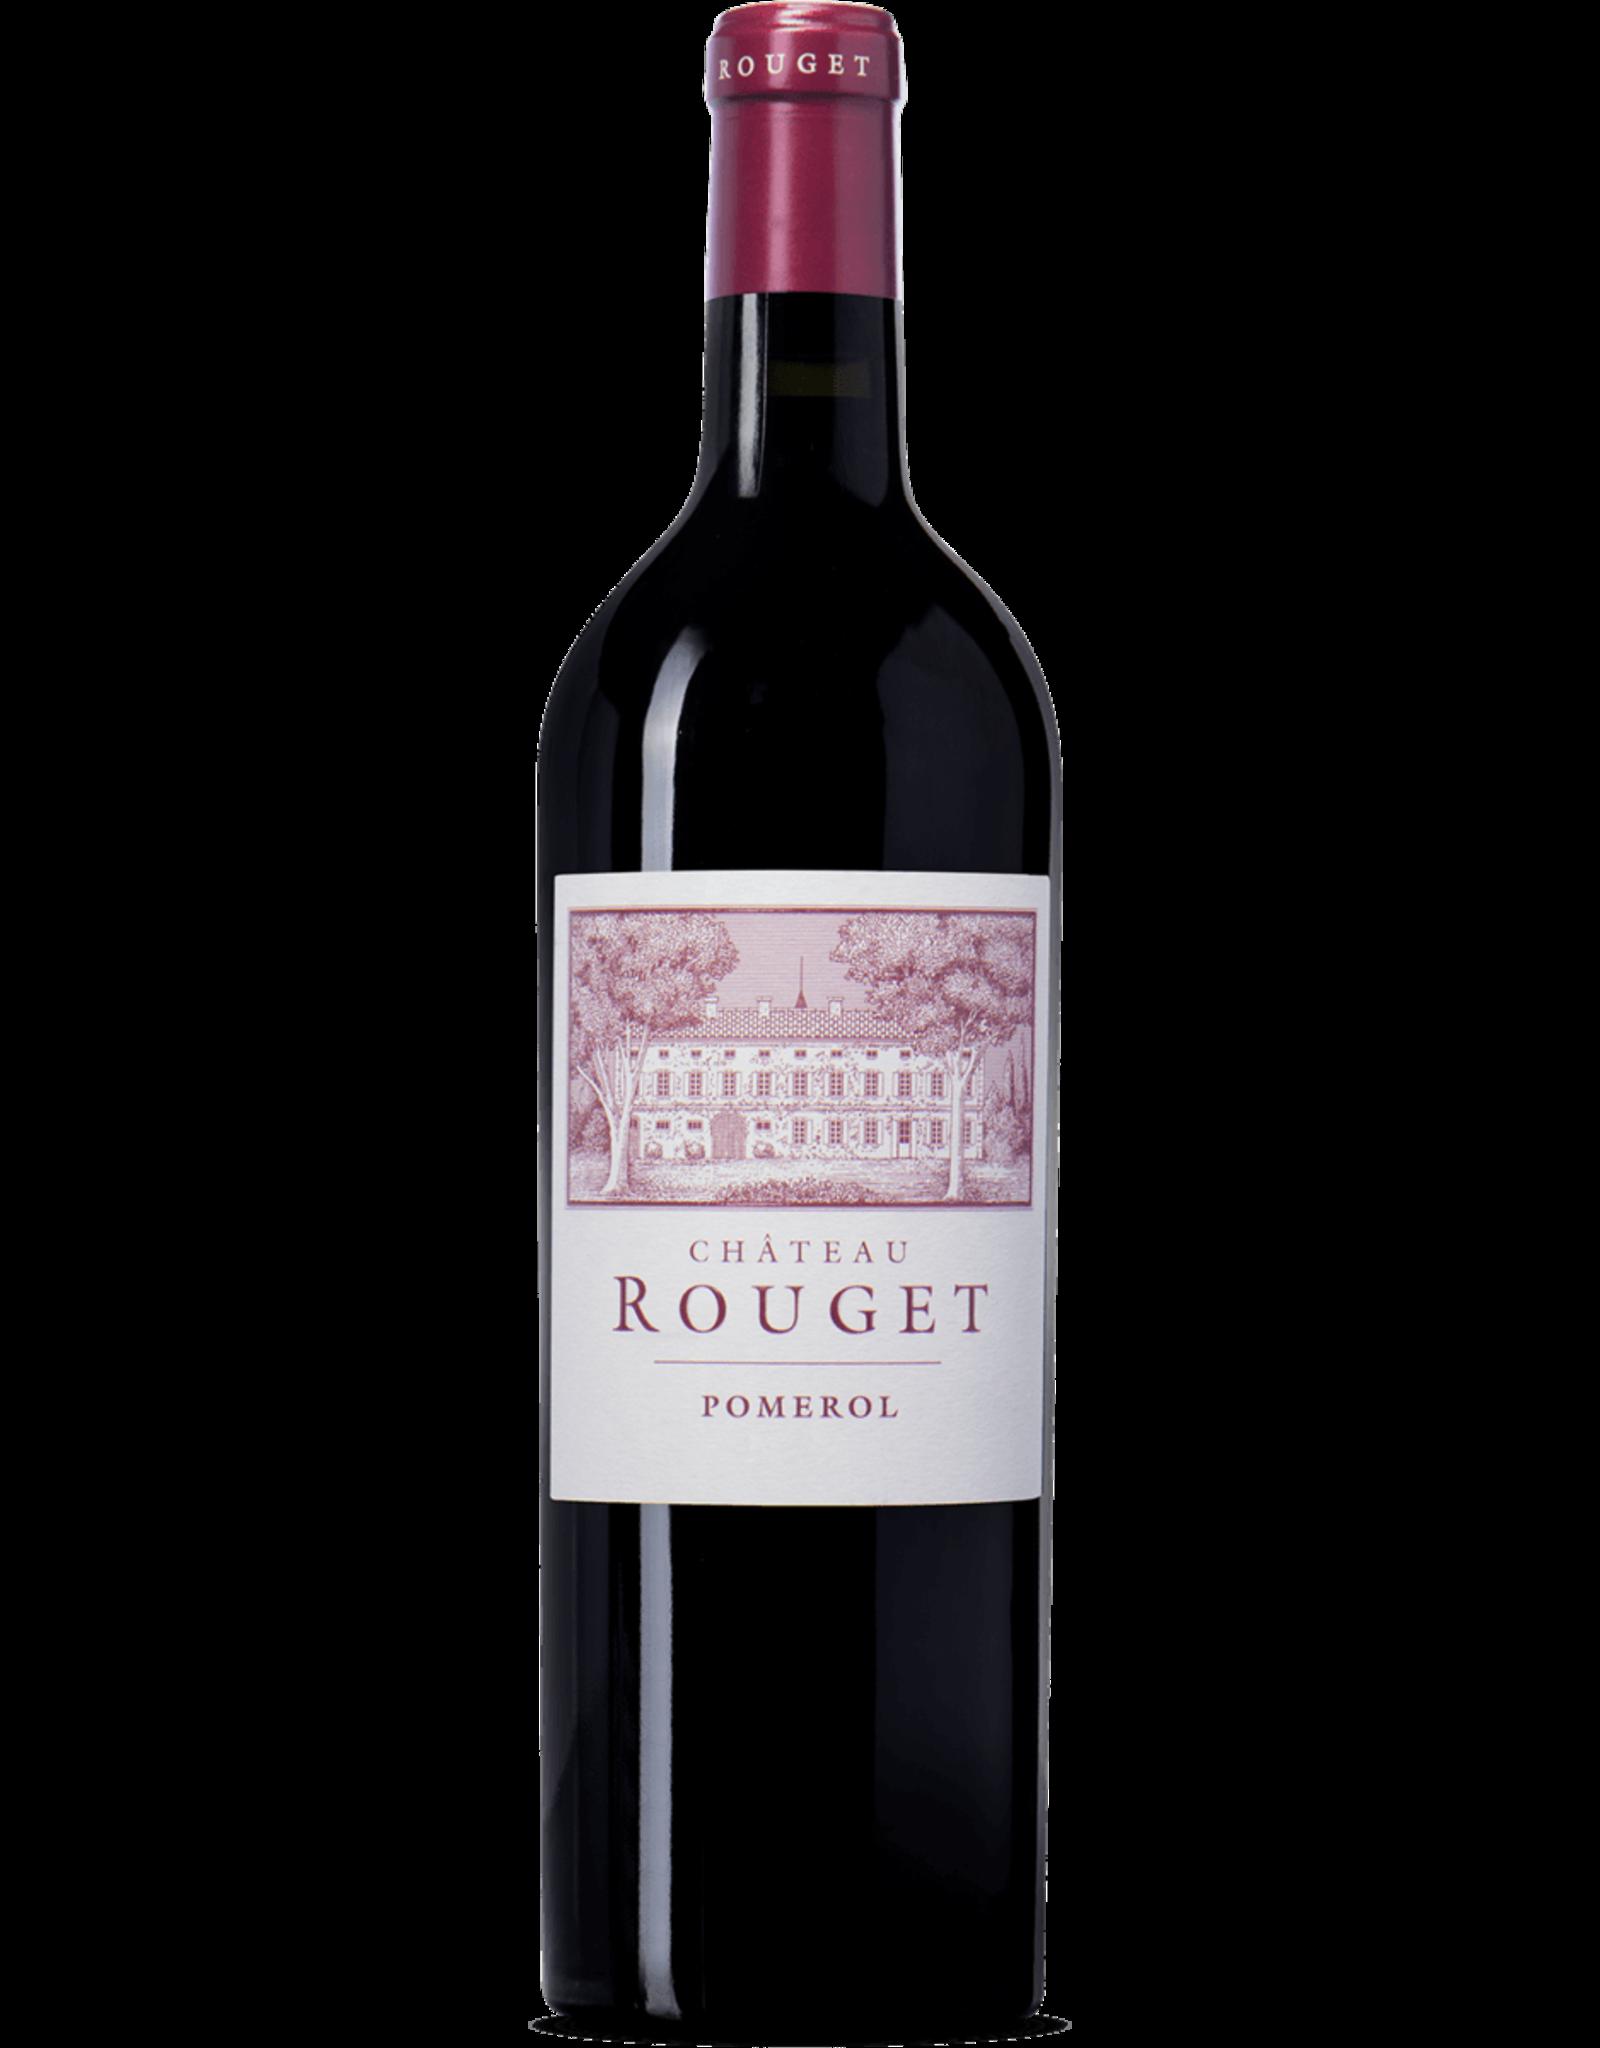 Château Rouget Château Rouget 2009 - Pomerol